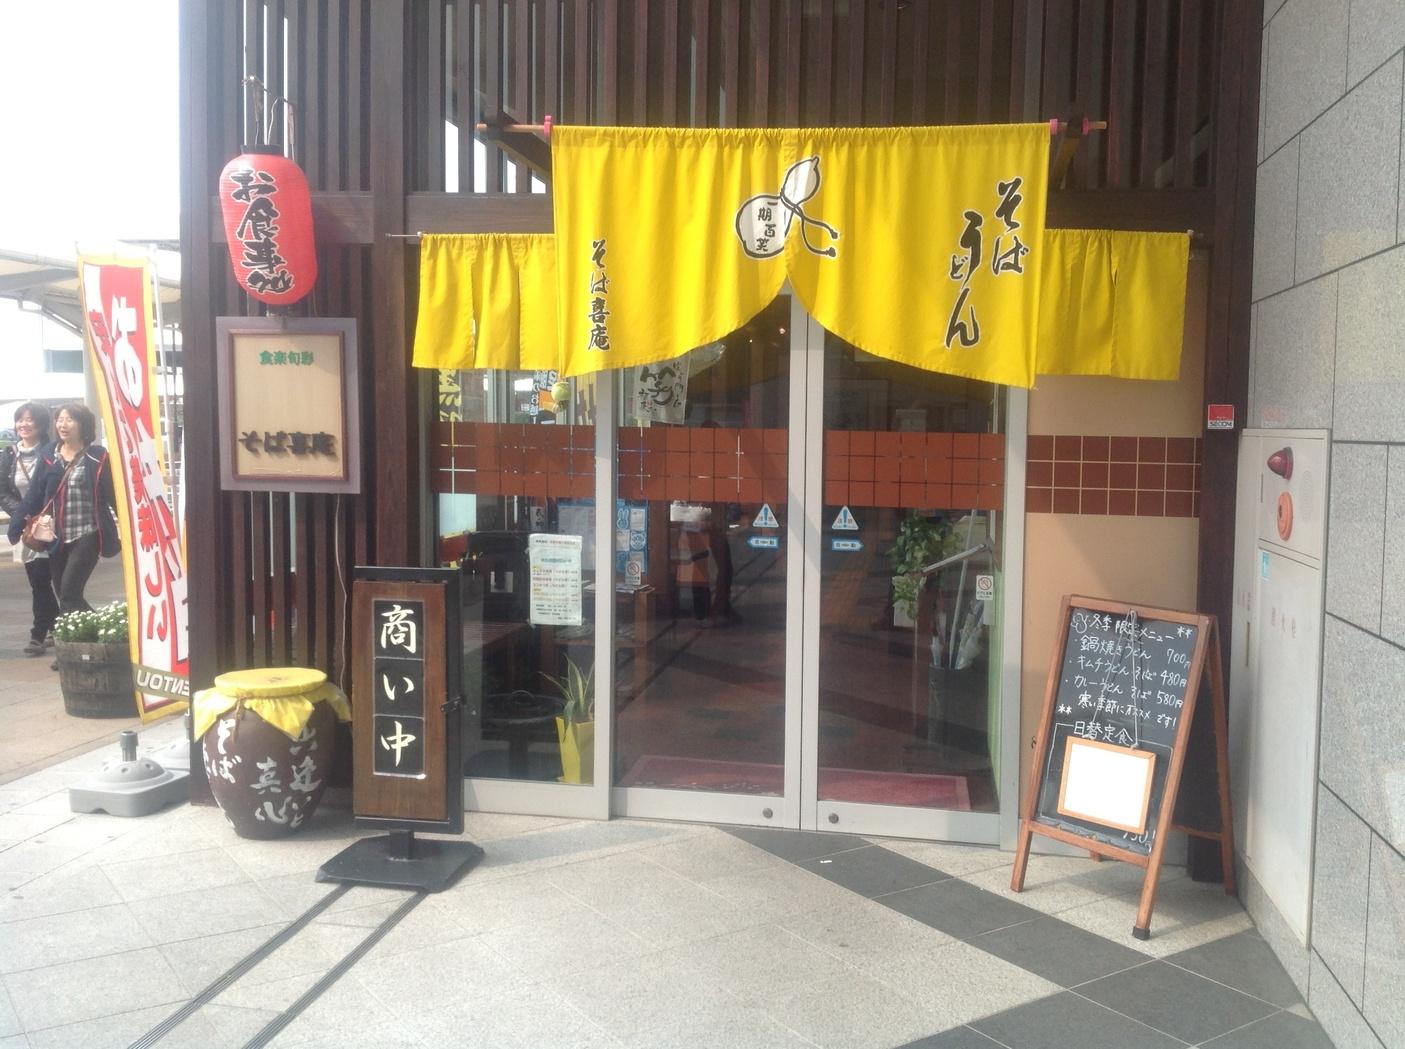 そば喜庵 薩摩川内駅店